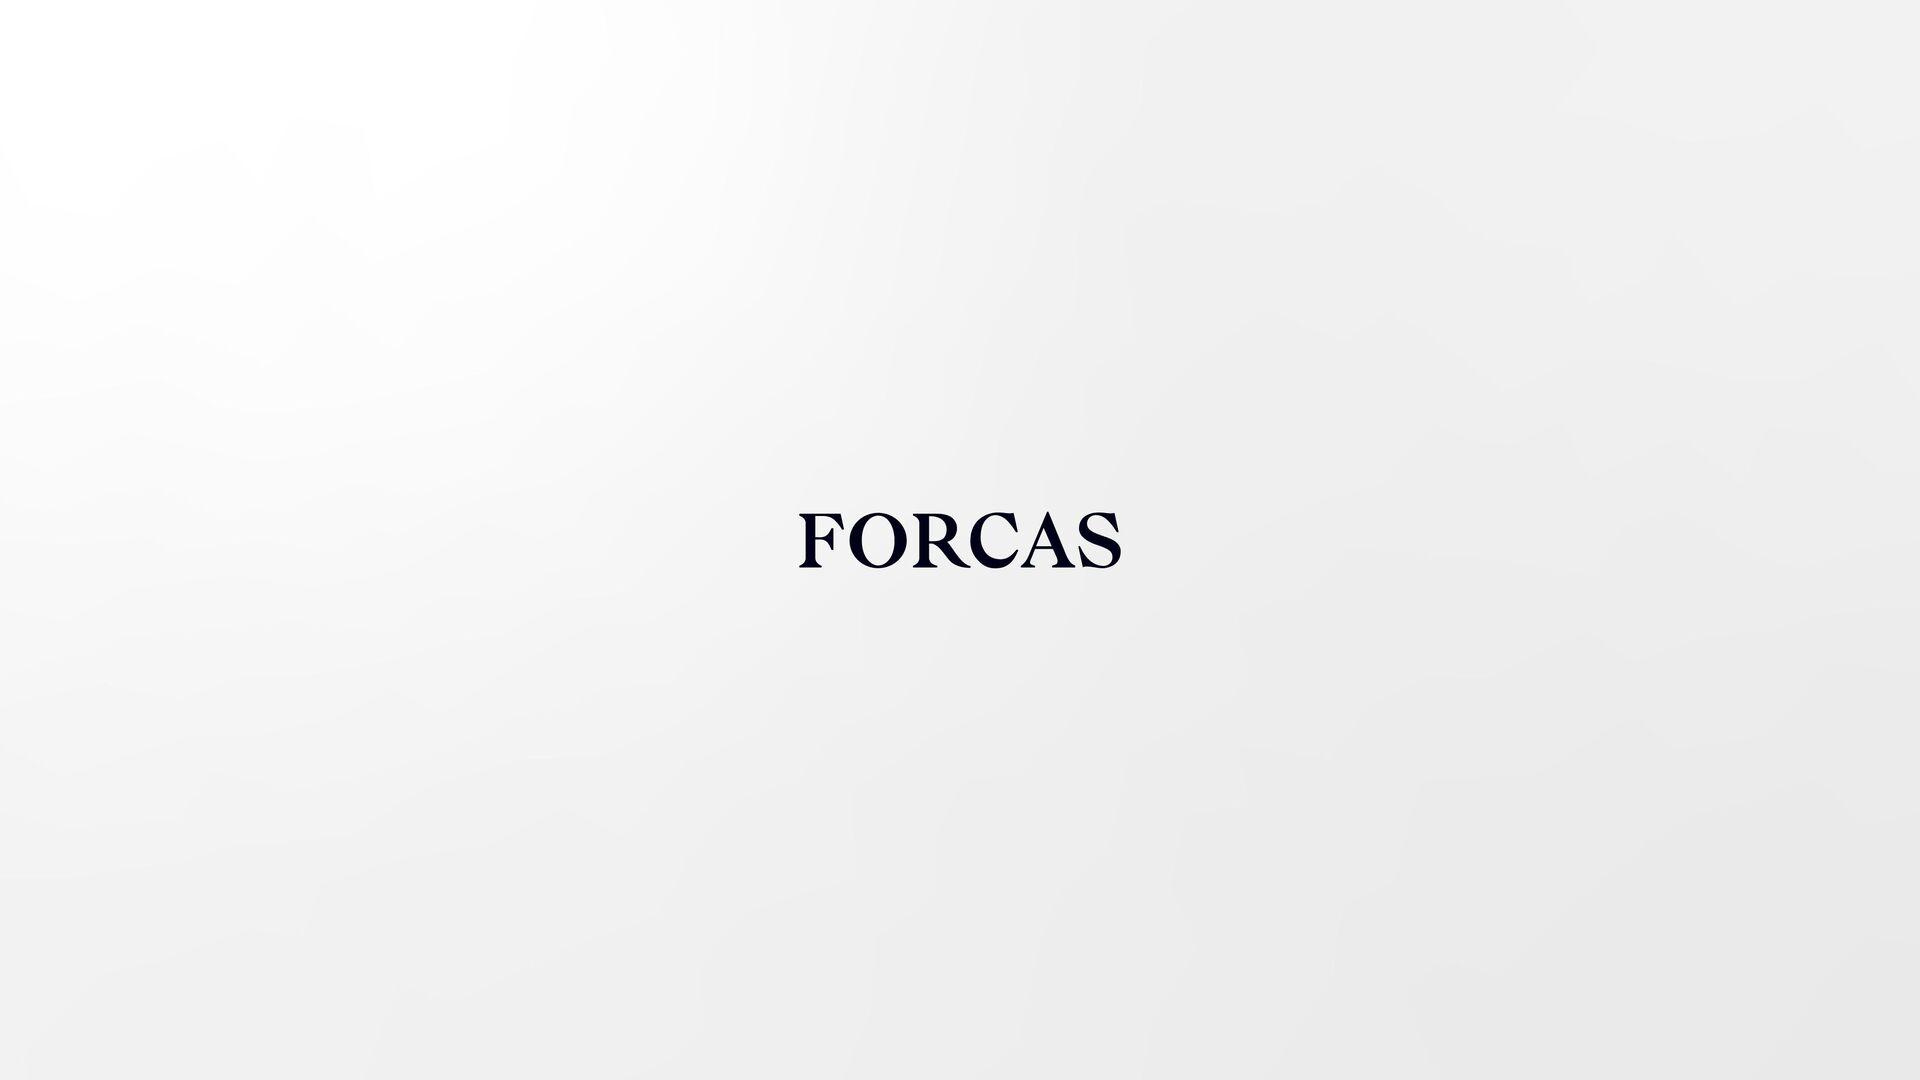 FORCAS CHALLENGE Challenge 09 ࠷ઌͷਪનٕज़Λ׆͔ͨ͠ ϓϩμ...